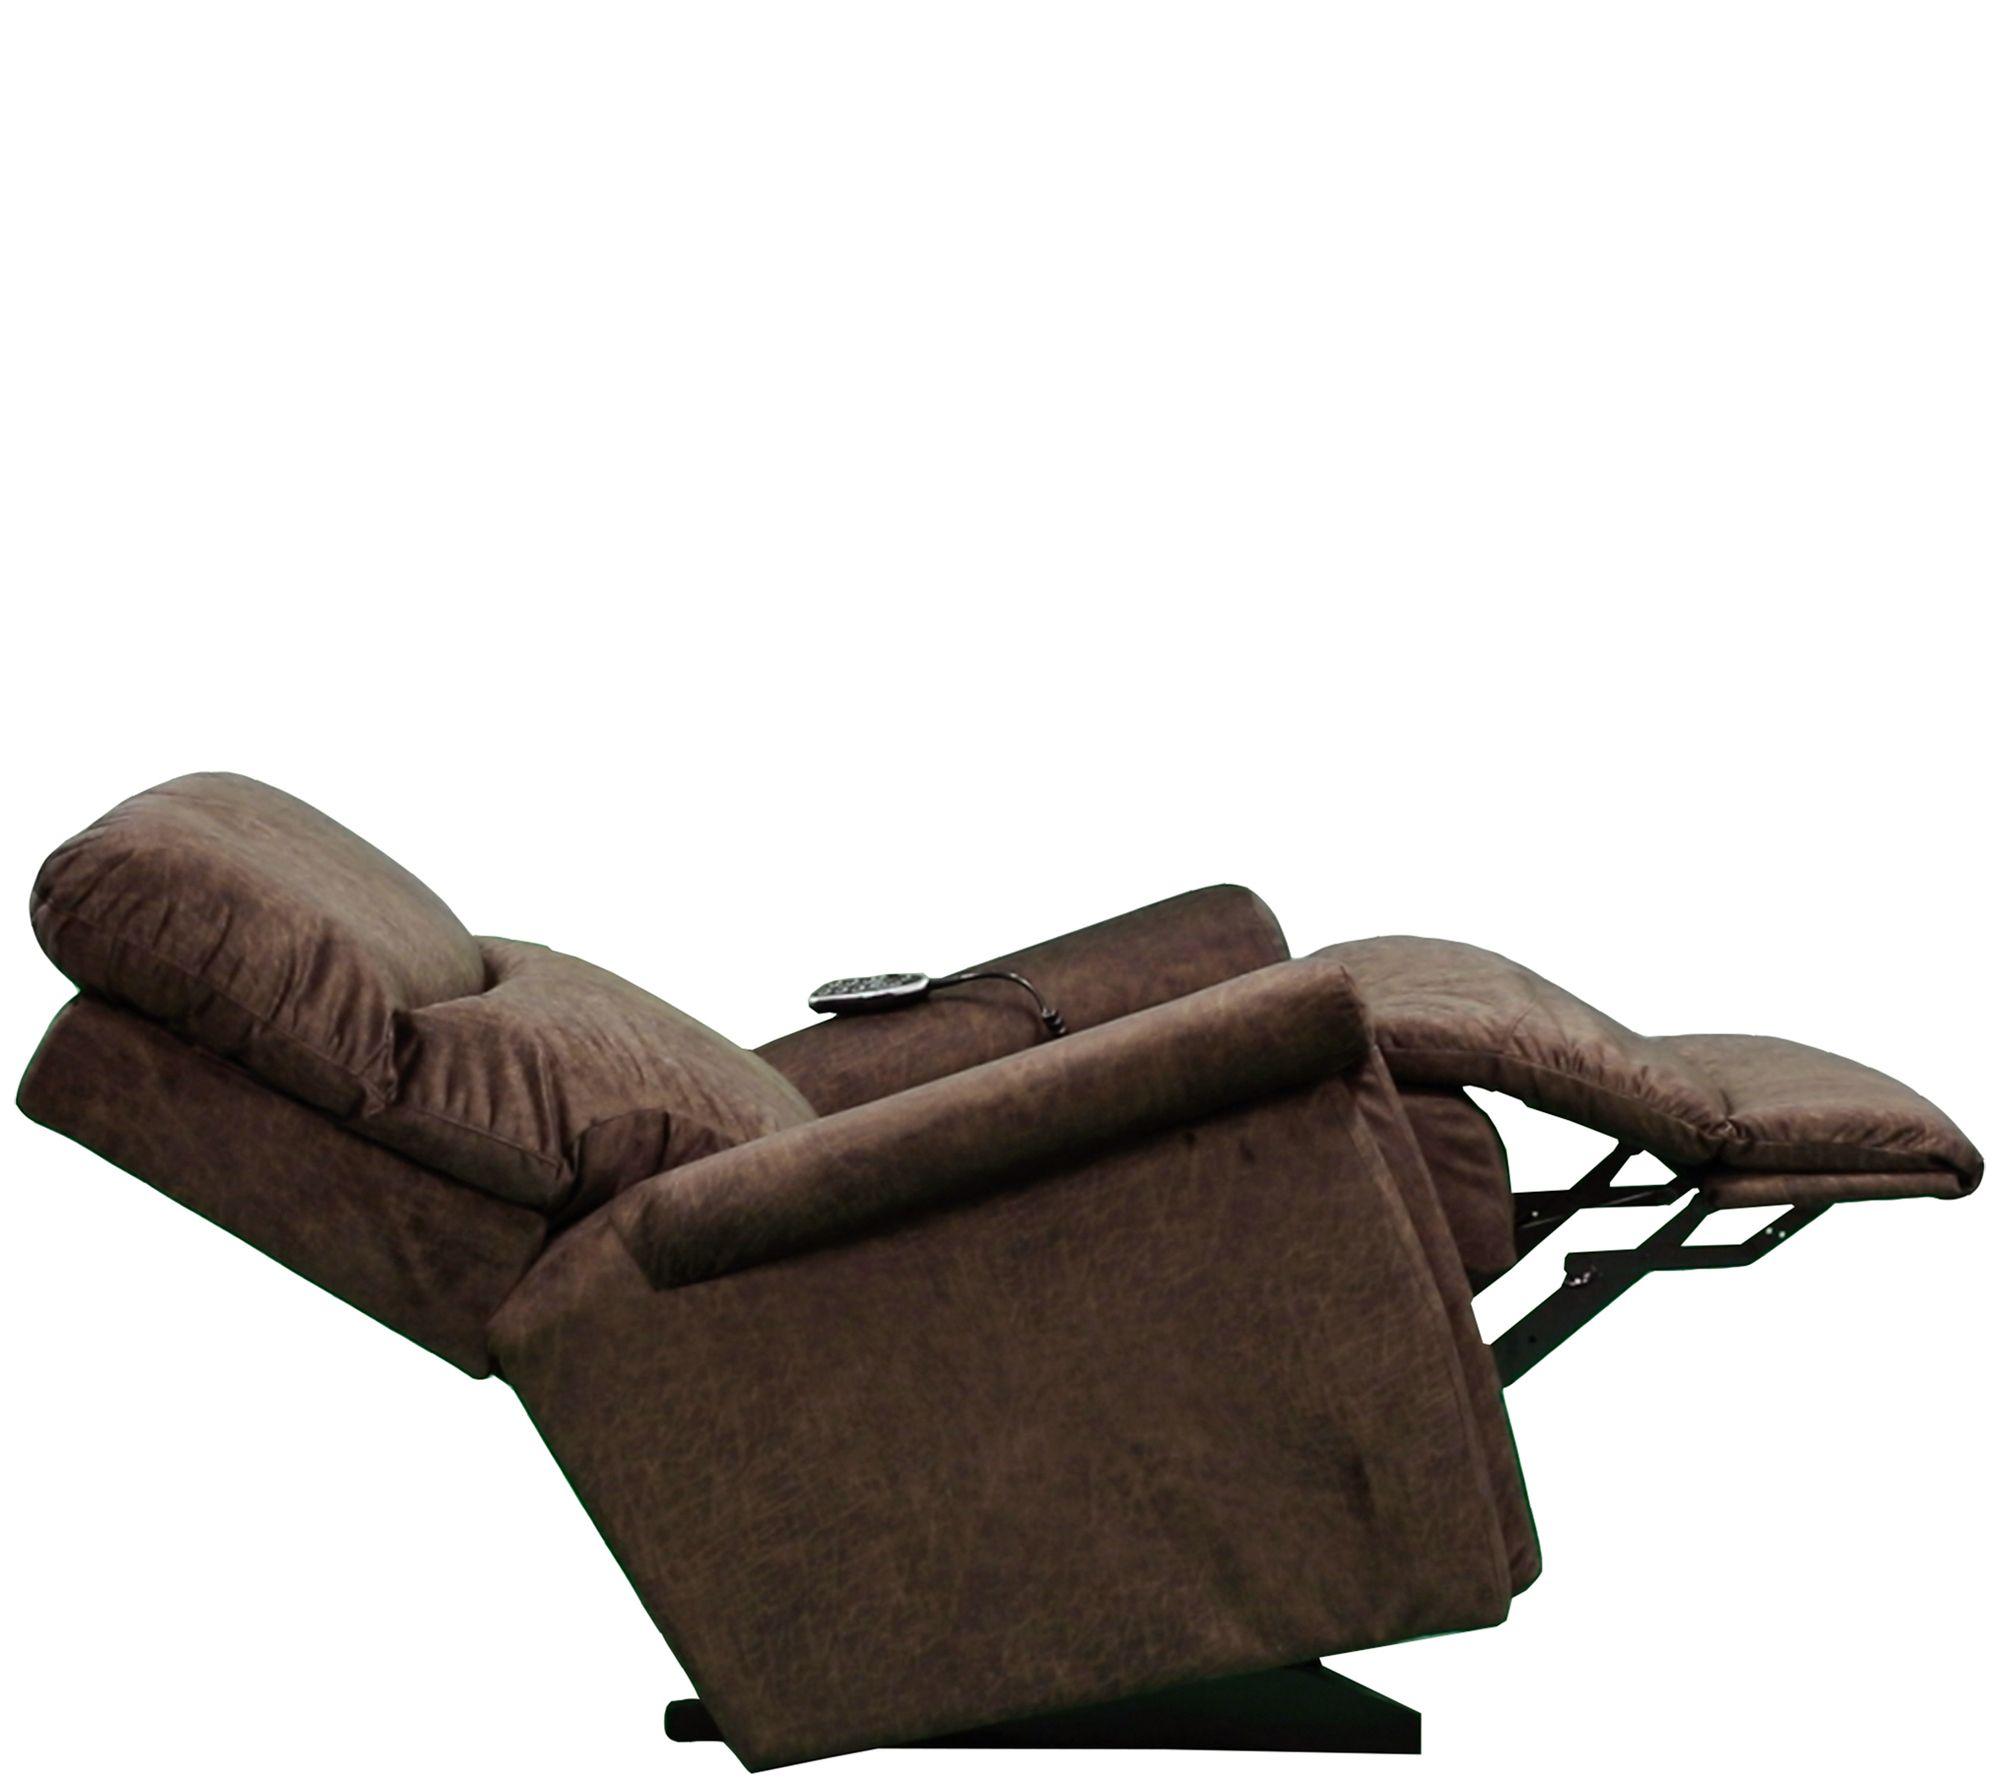 Stupendous La Z Boy Power Xr Baylor Recliner Qvc Com Cjindustries Chair Design For Home Cjindustriesco